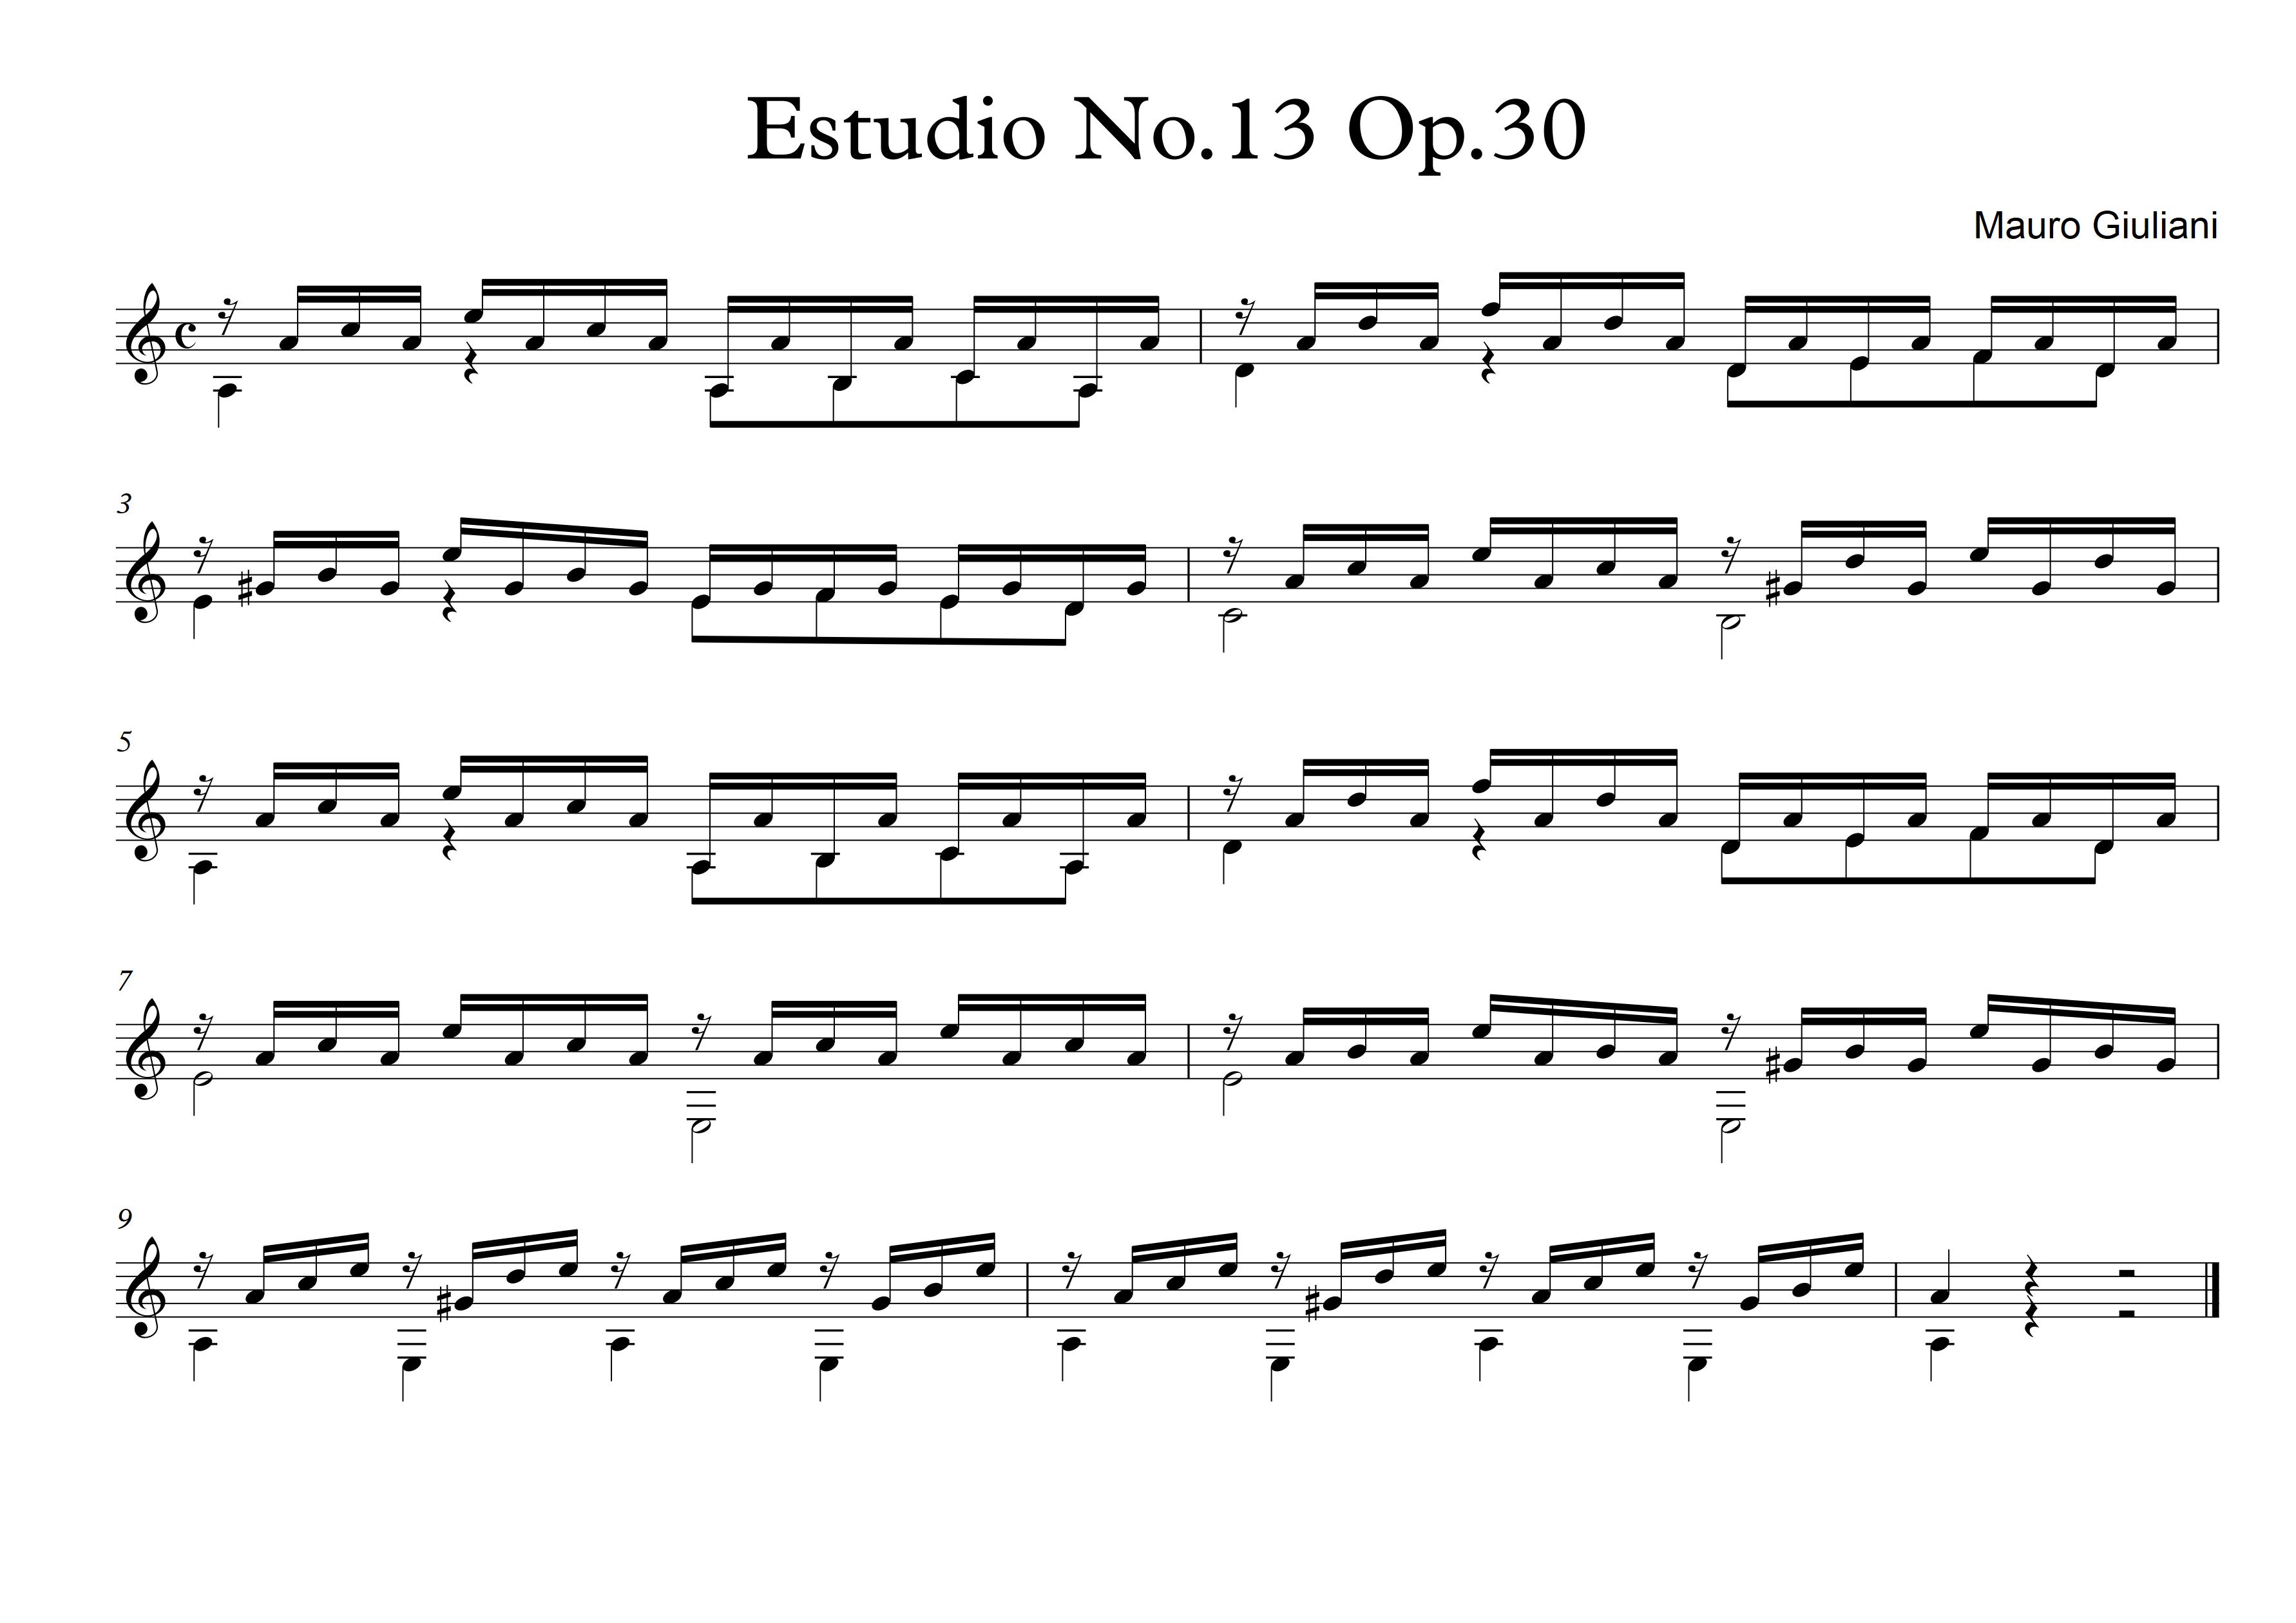 Etude no13 op30 - Mauro Giuliani